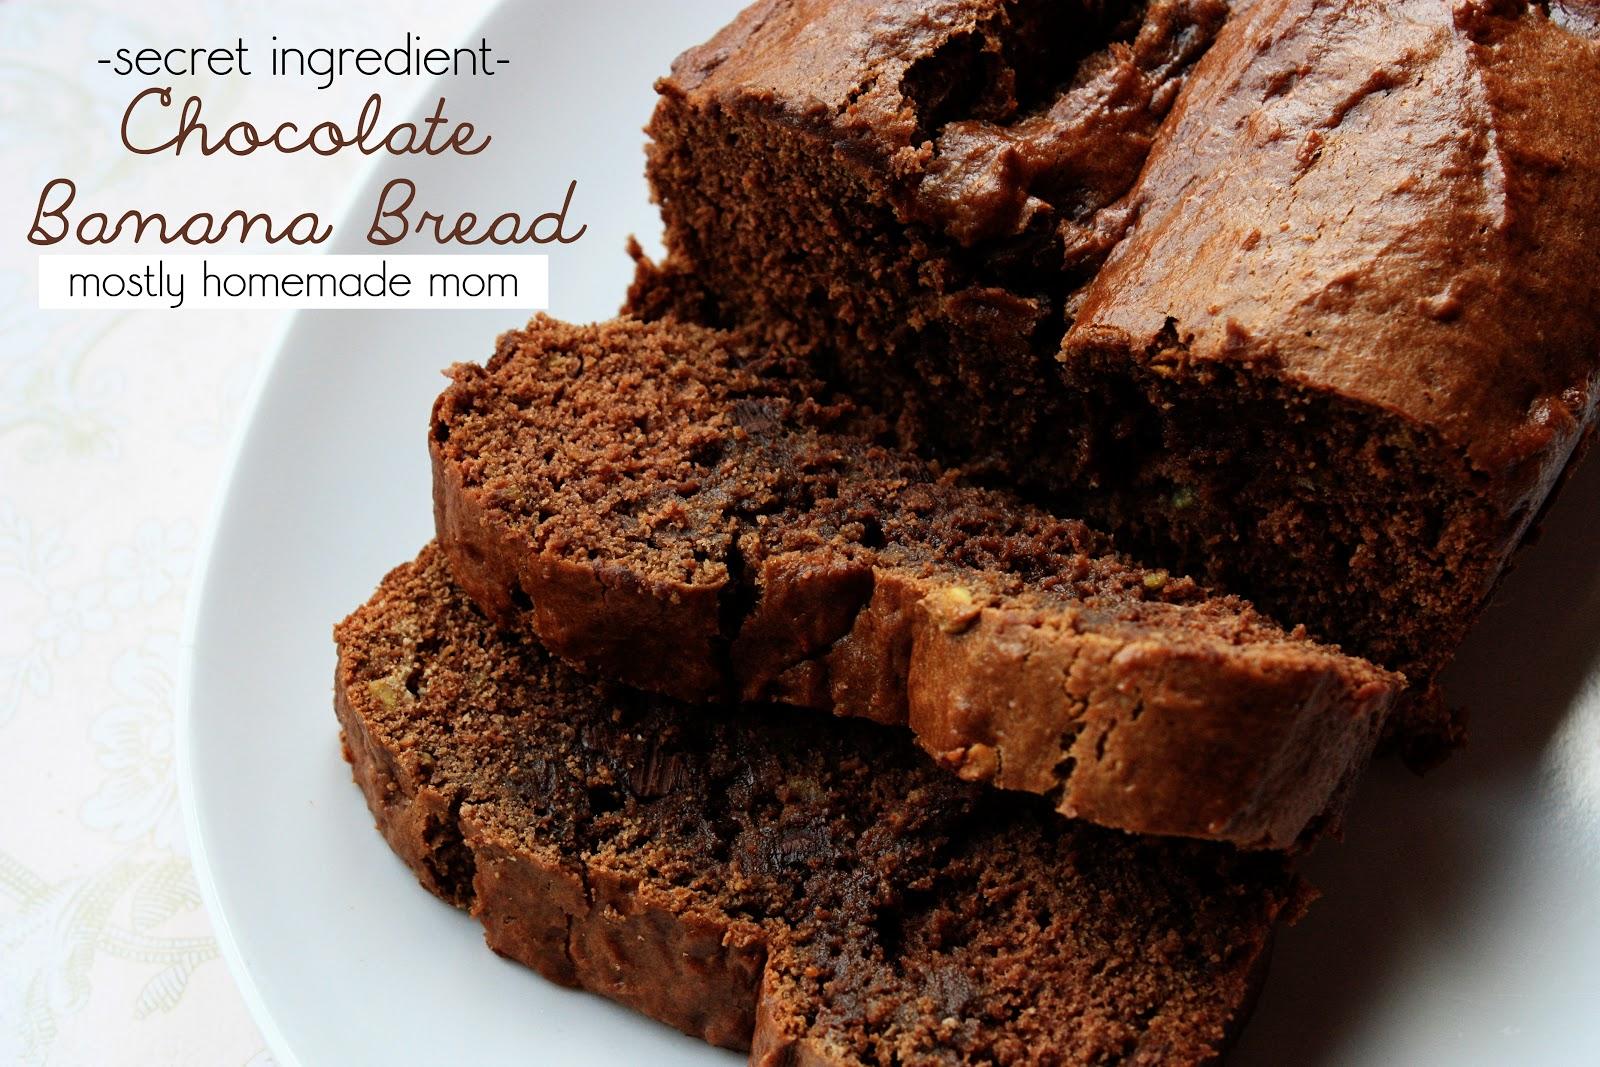 Secret Ingredient Chocolate Banana Bread   Mostly Homemade Mom